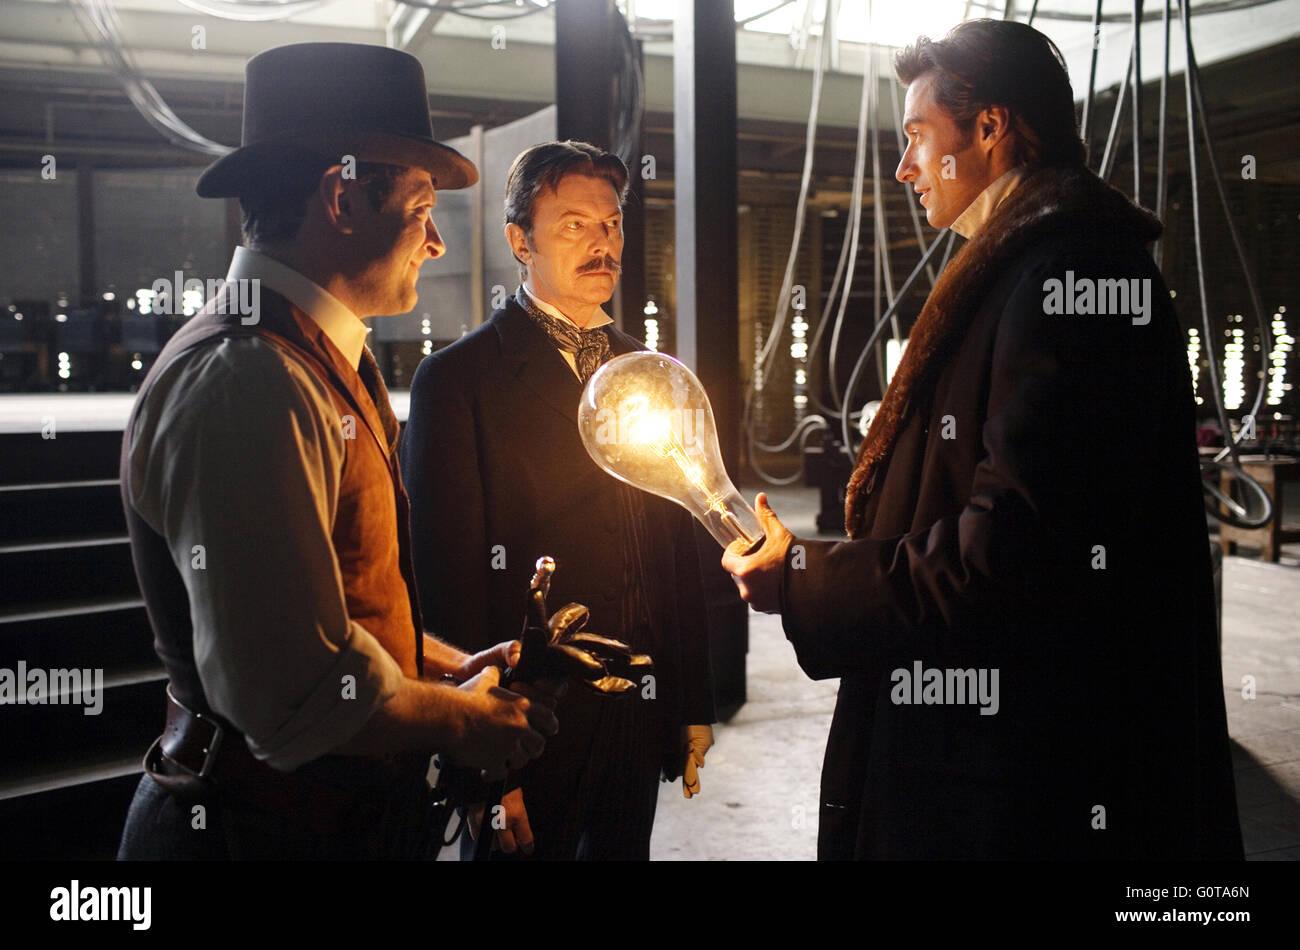 Andy Serkis (Roger Alley), David Bowie (Nikola Tesla) and Hugh Jackman (Robert Angier) in Warner Bros. Pictures - Stock Image